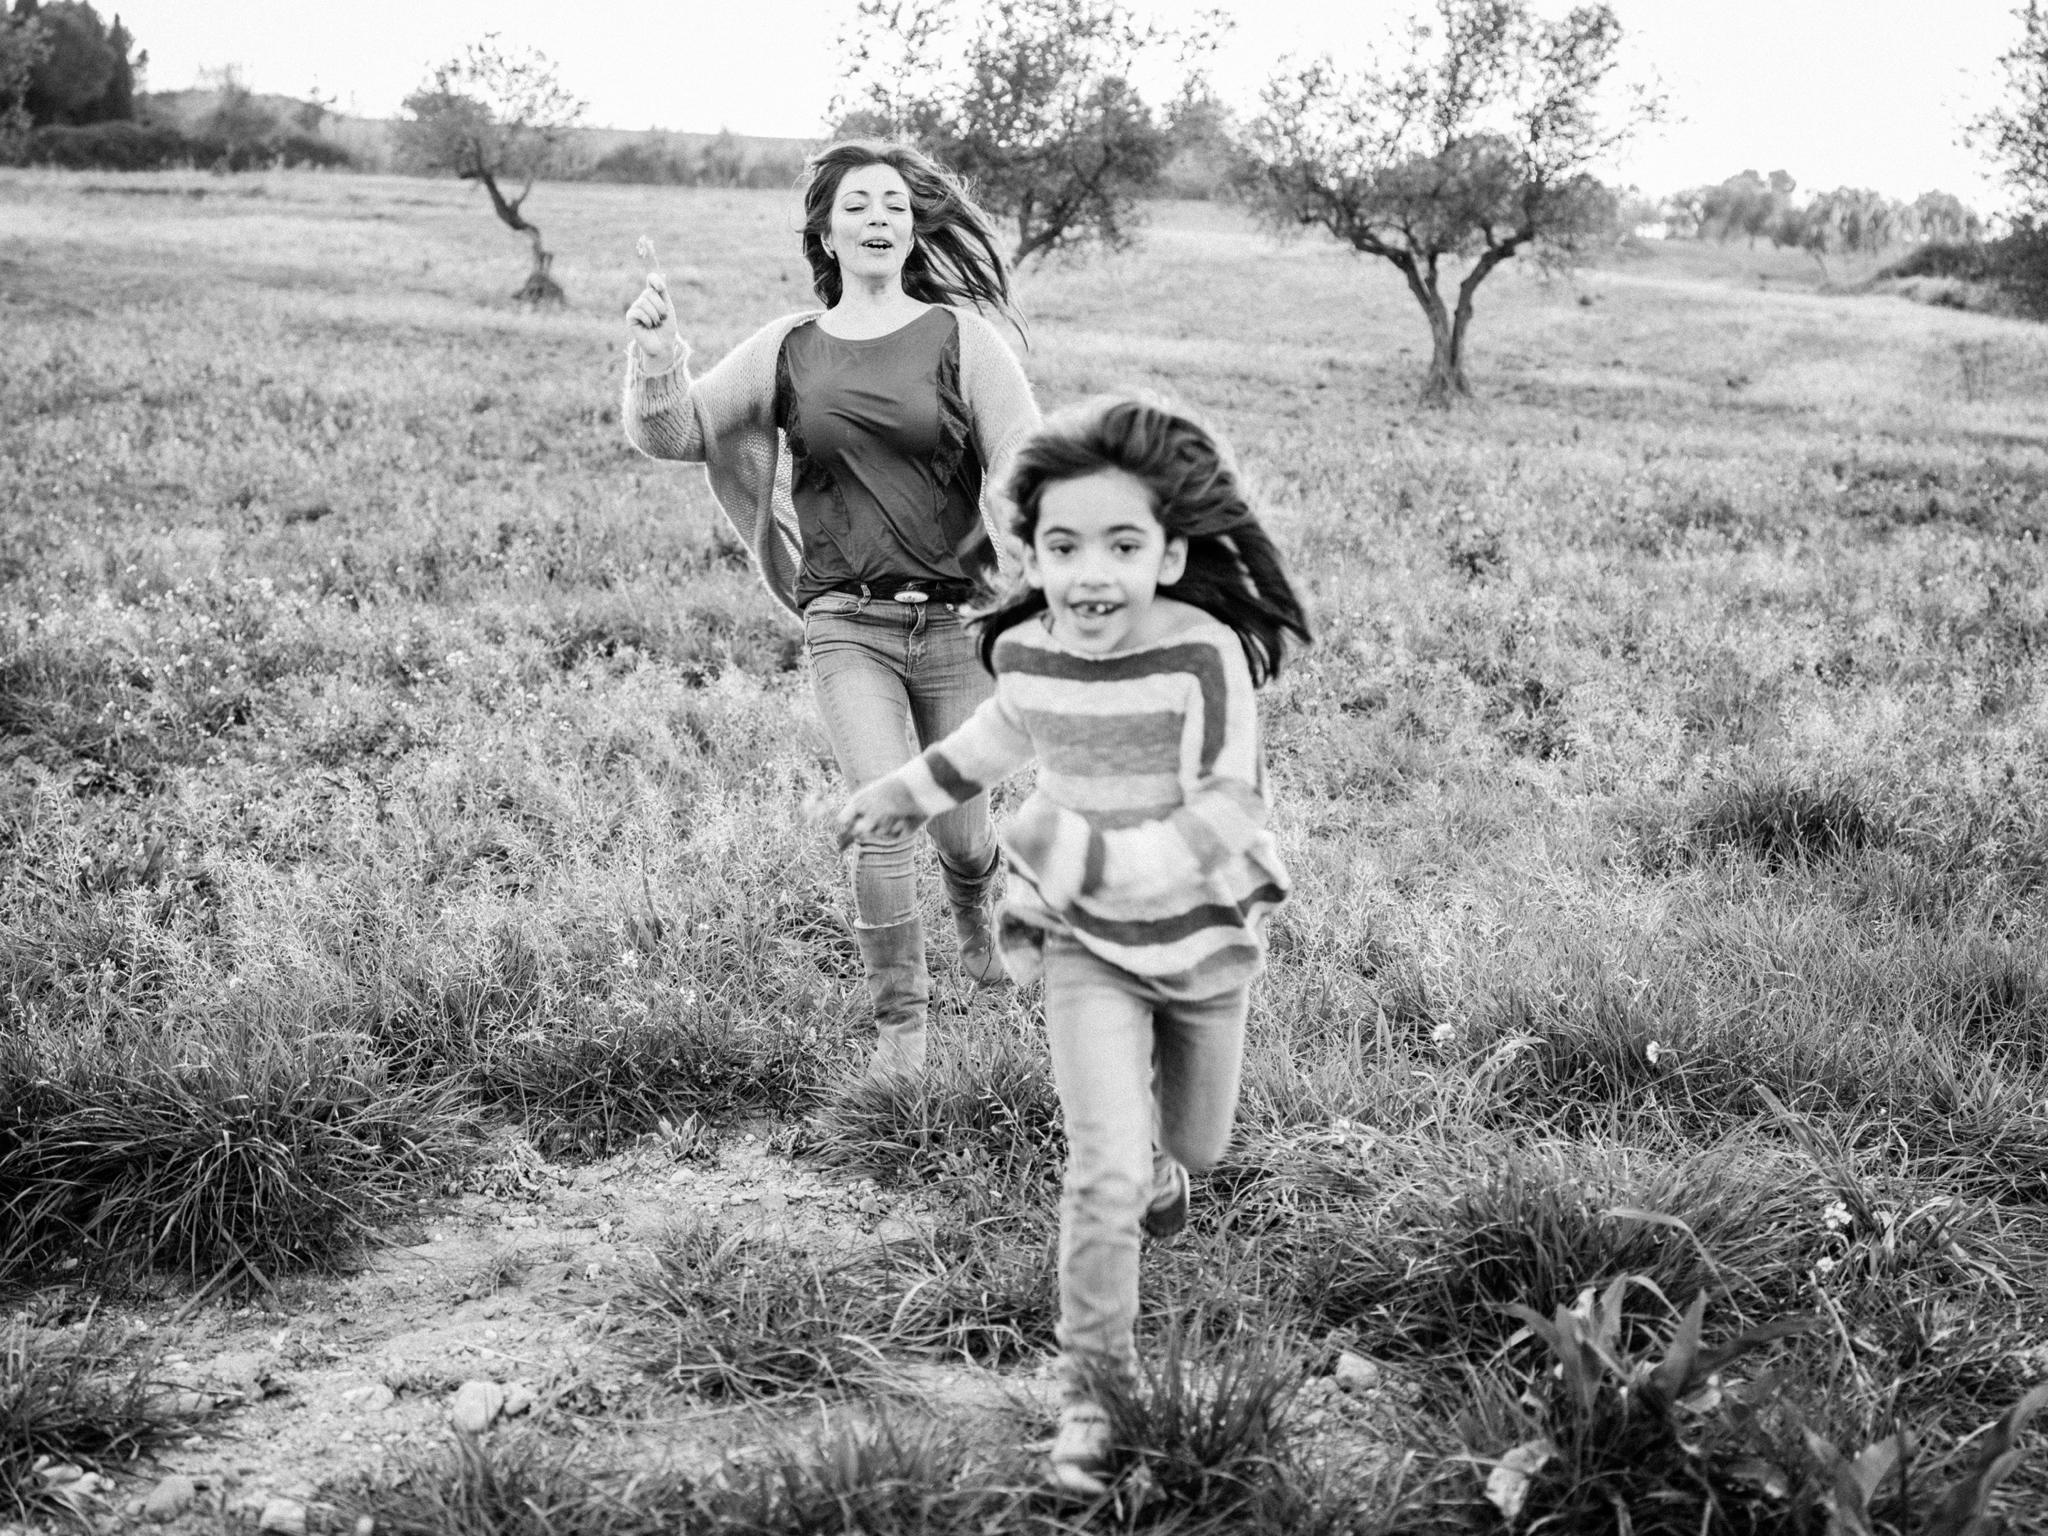 fotografia-infantil-familiar23.jpg